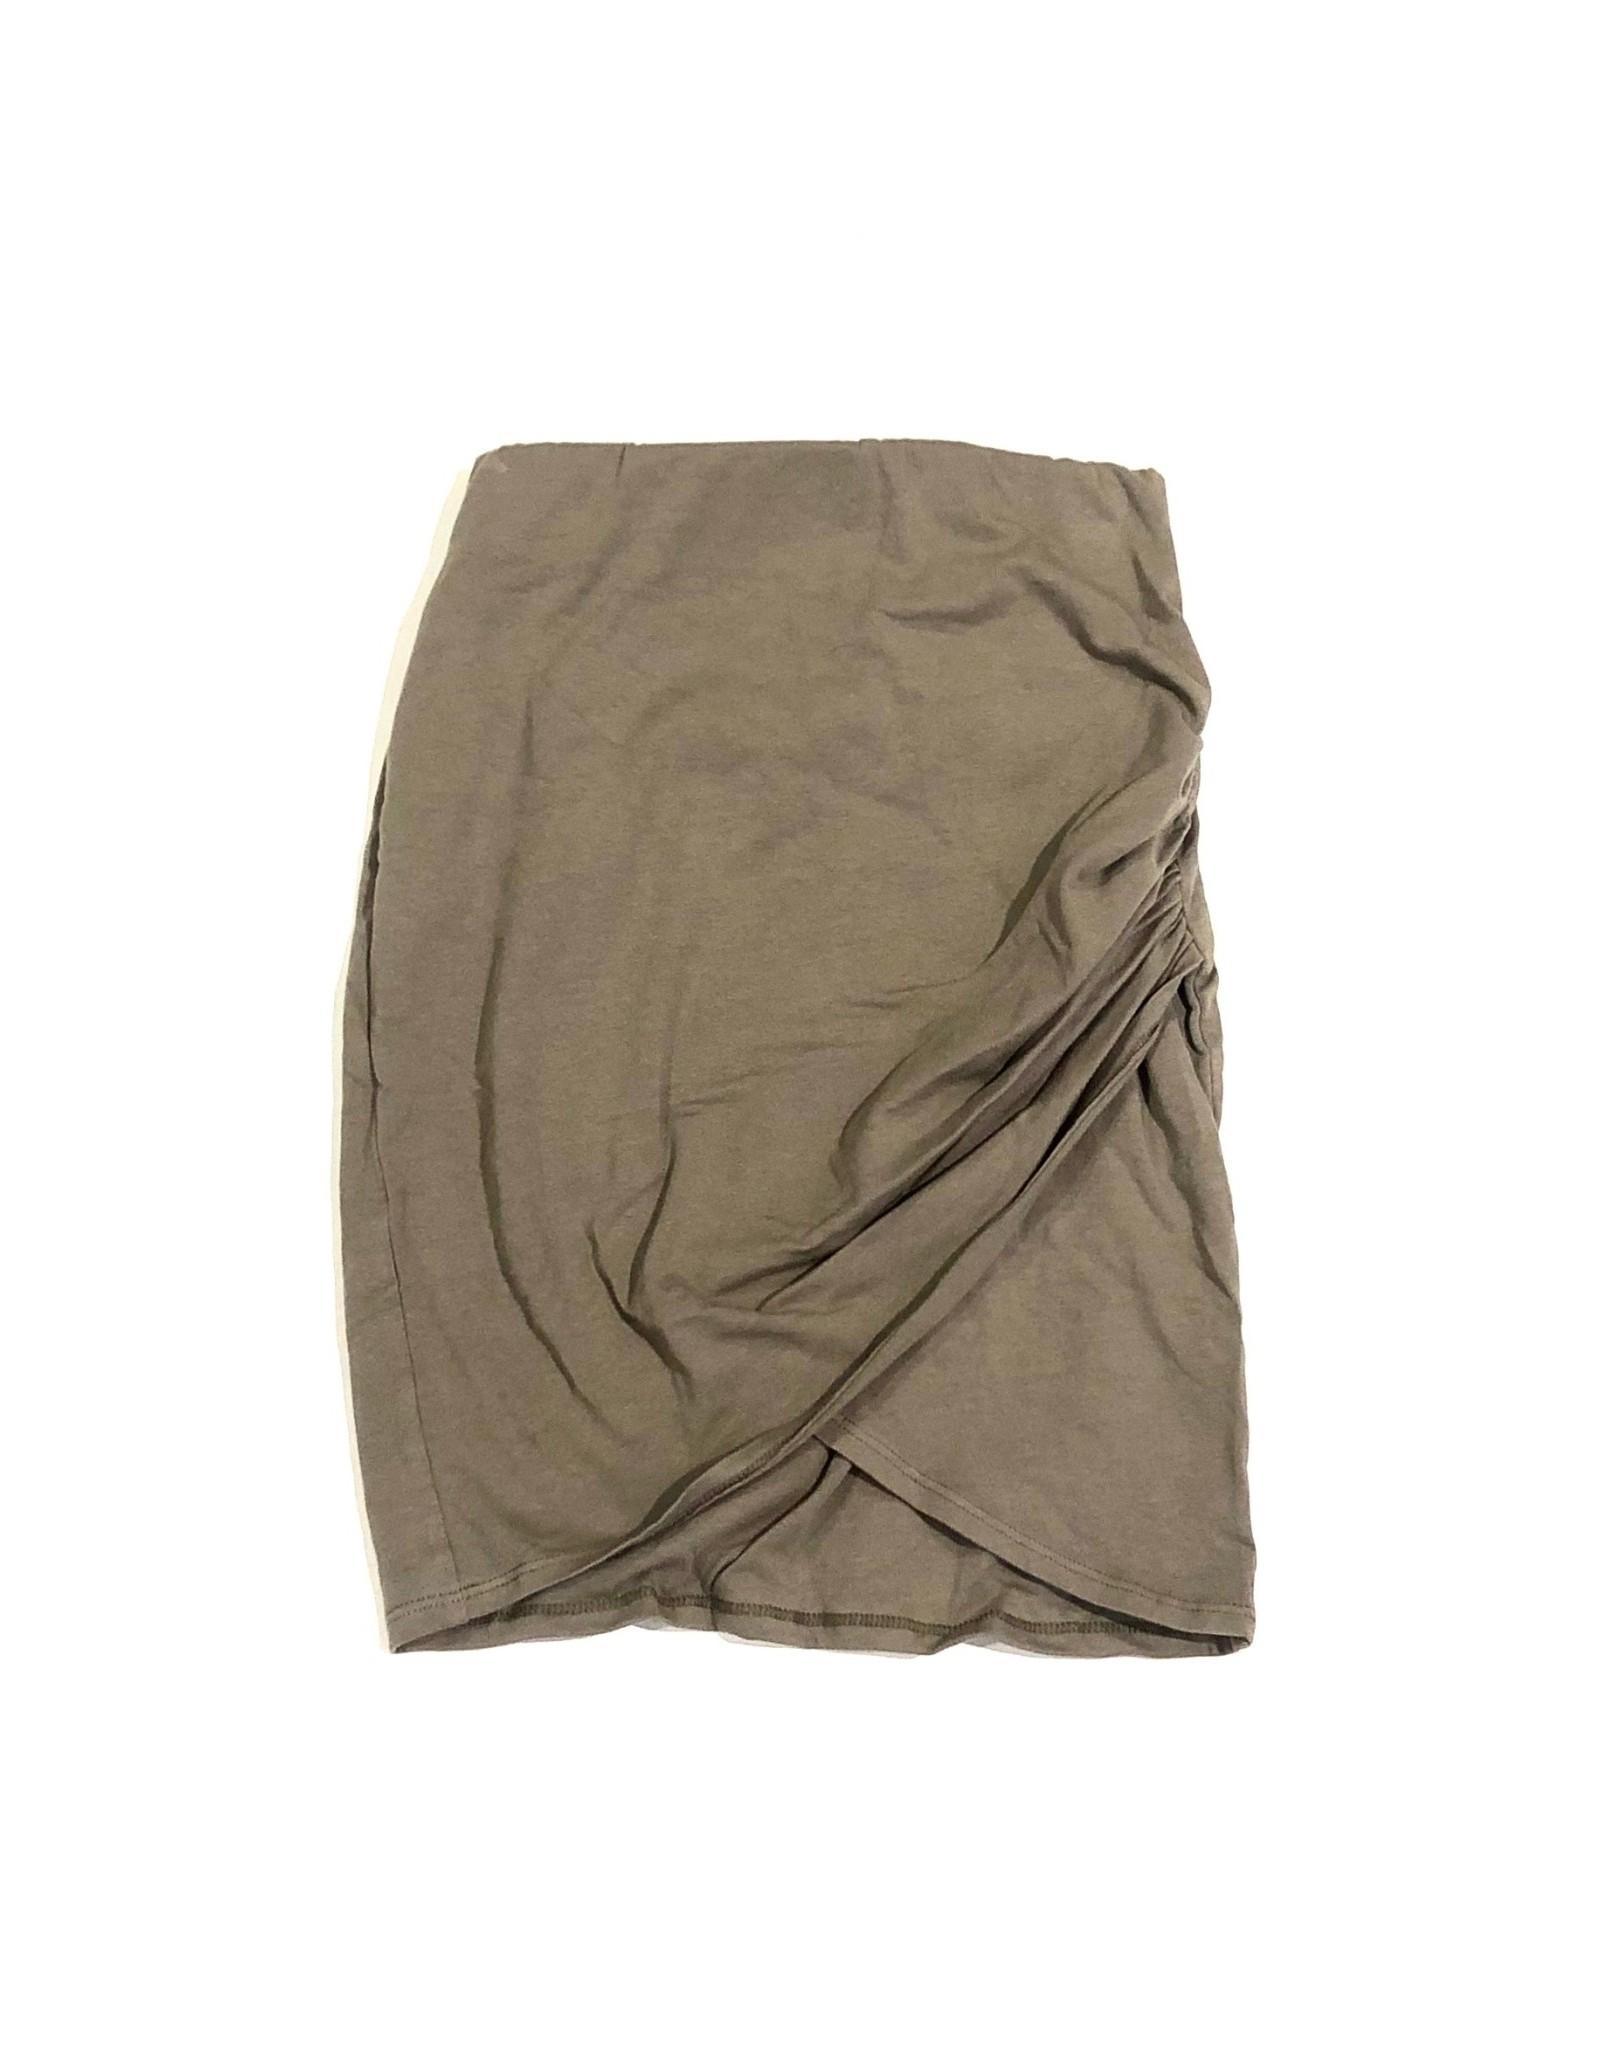 MS mini skirt 1080